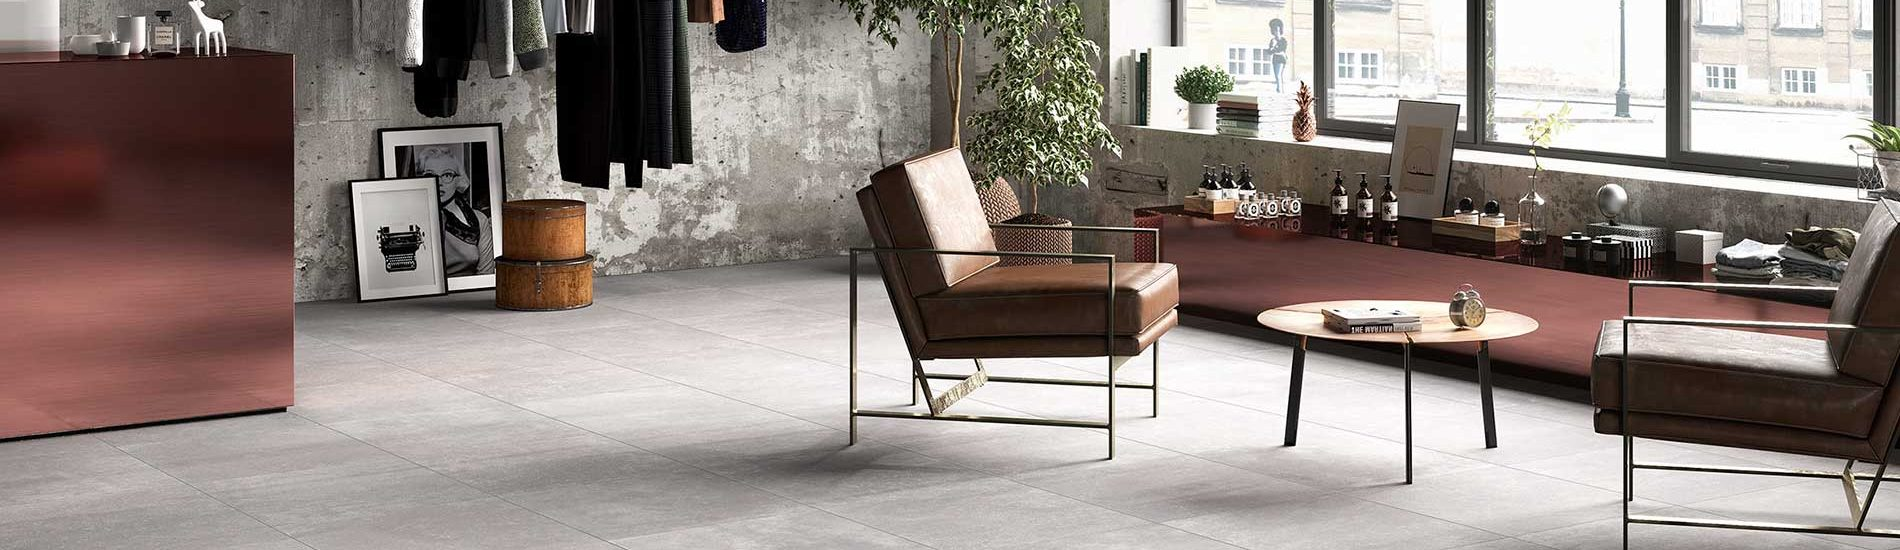 banner-marwari-italian-contemporary-stone-look-italian-tile-unicom-starker-orange-county